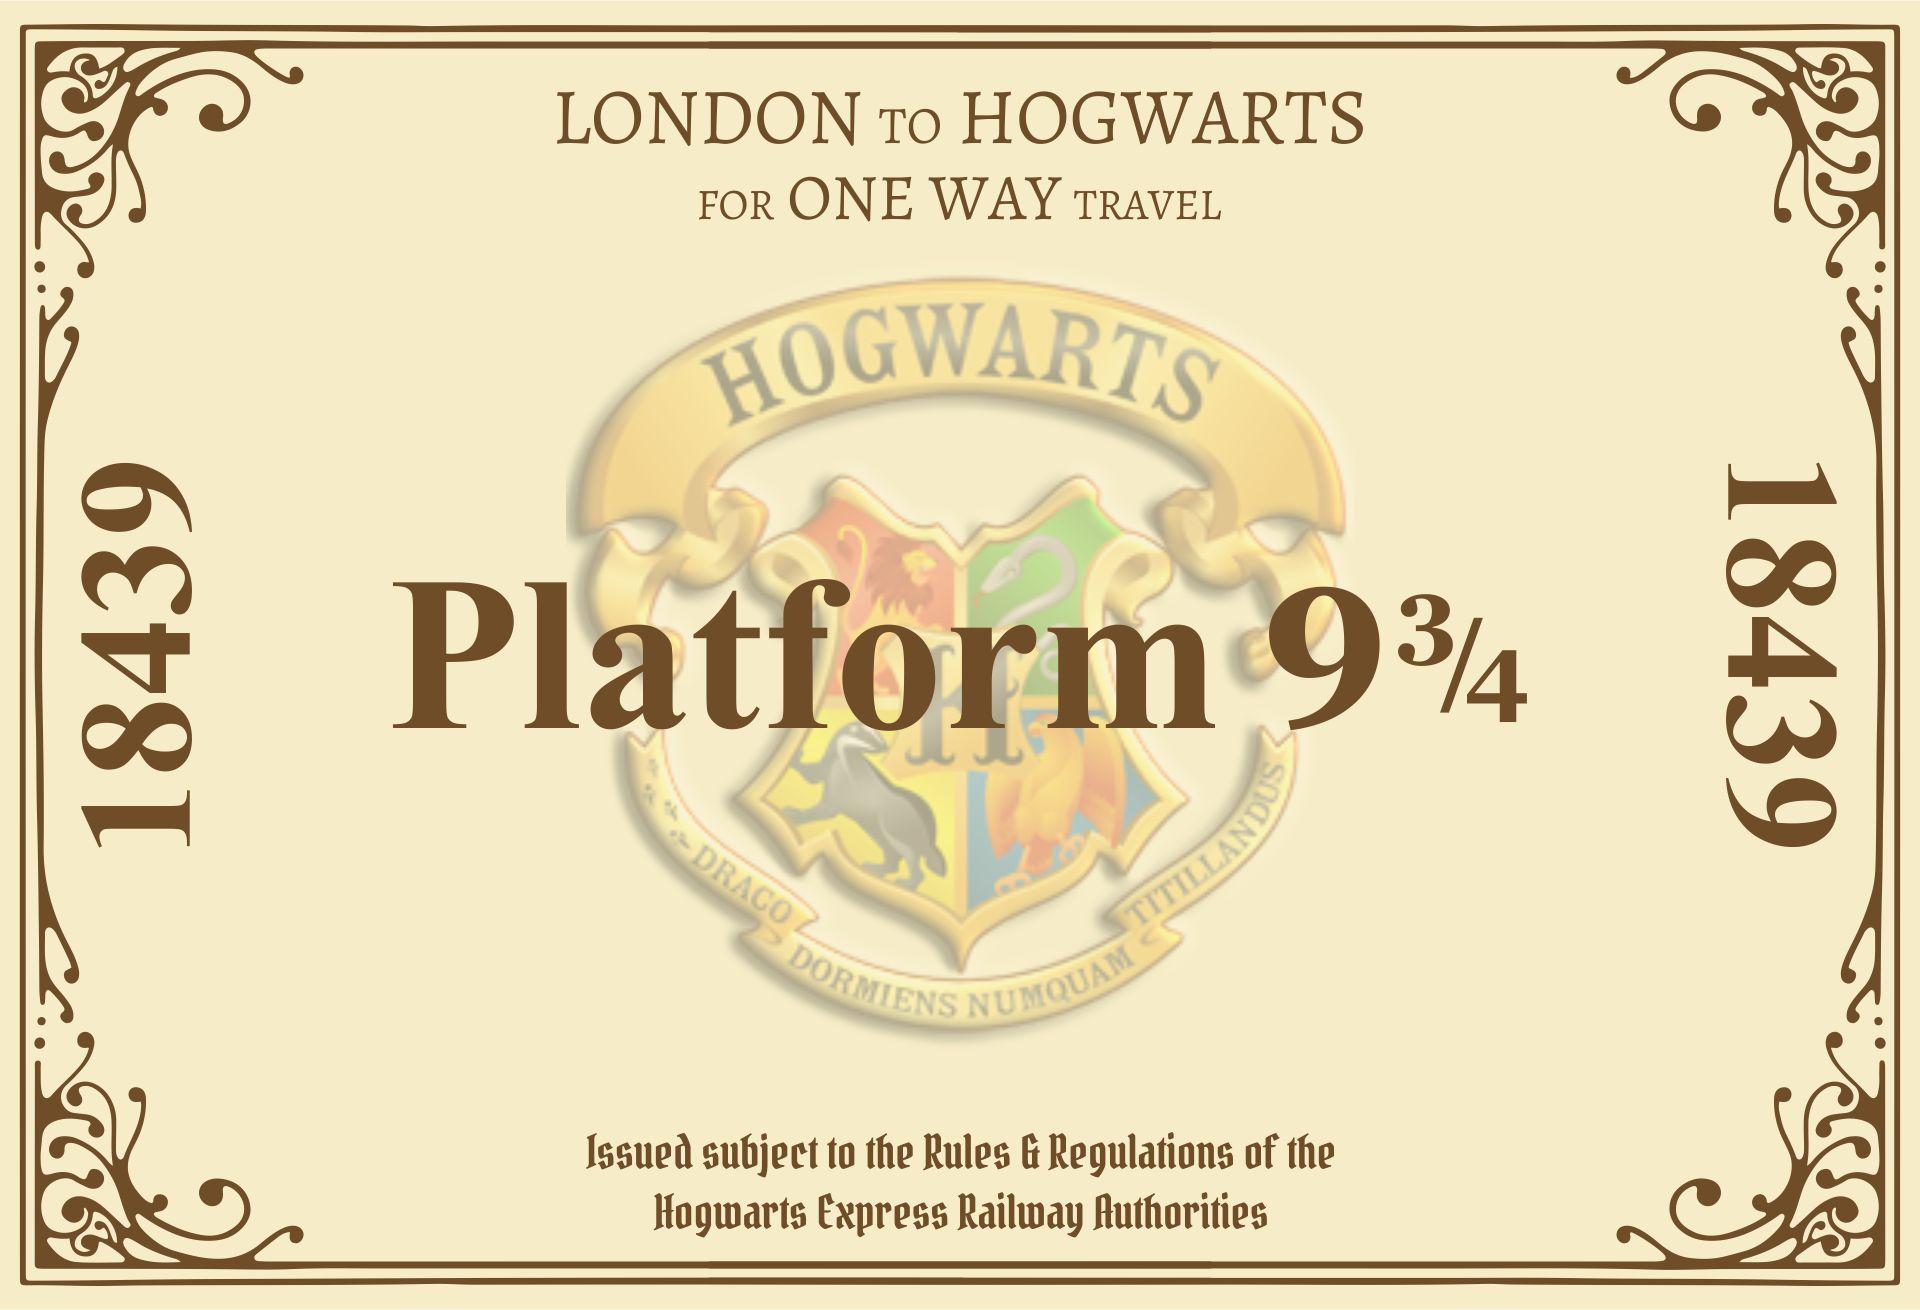 Harry Potter Hogwarts Express Ticket